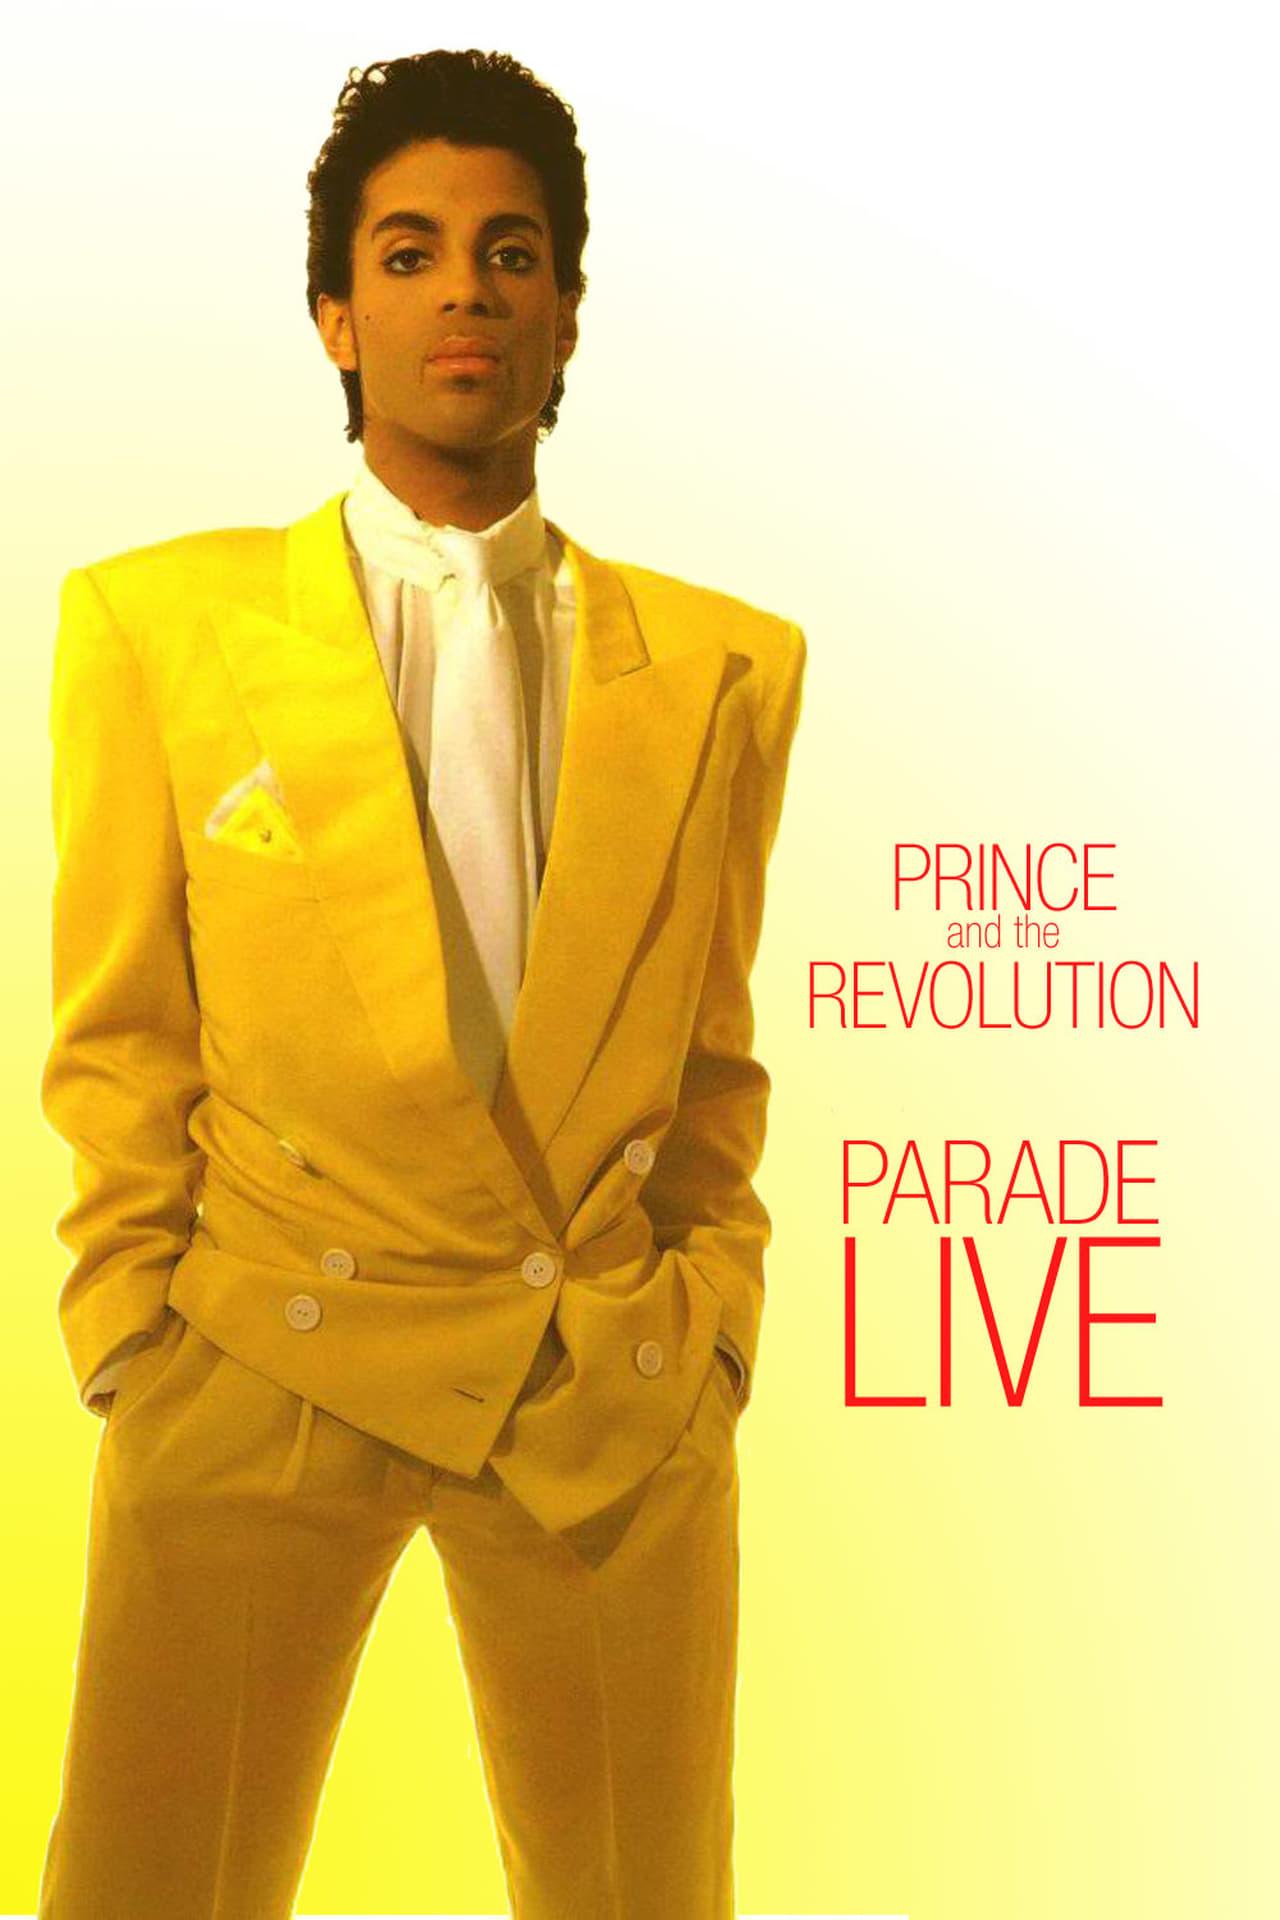 Prince and the Revolution: Parade LIVE